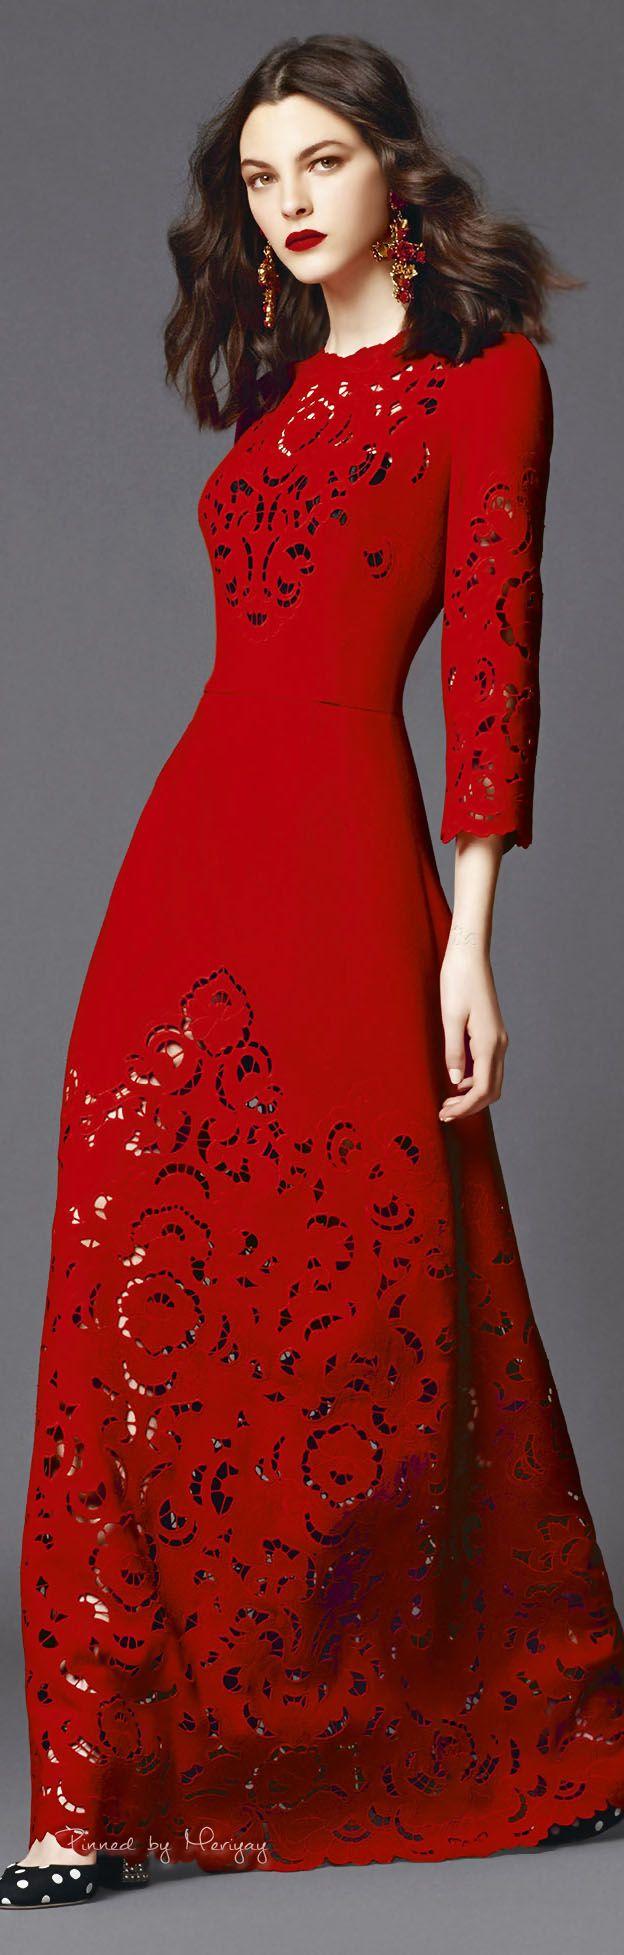 The Millionairess of Pennsylvania / karen cox.  Ravishing red / Valentine's Day. ♔Dolce & Gabbana.2015♔